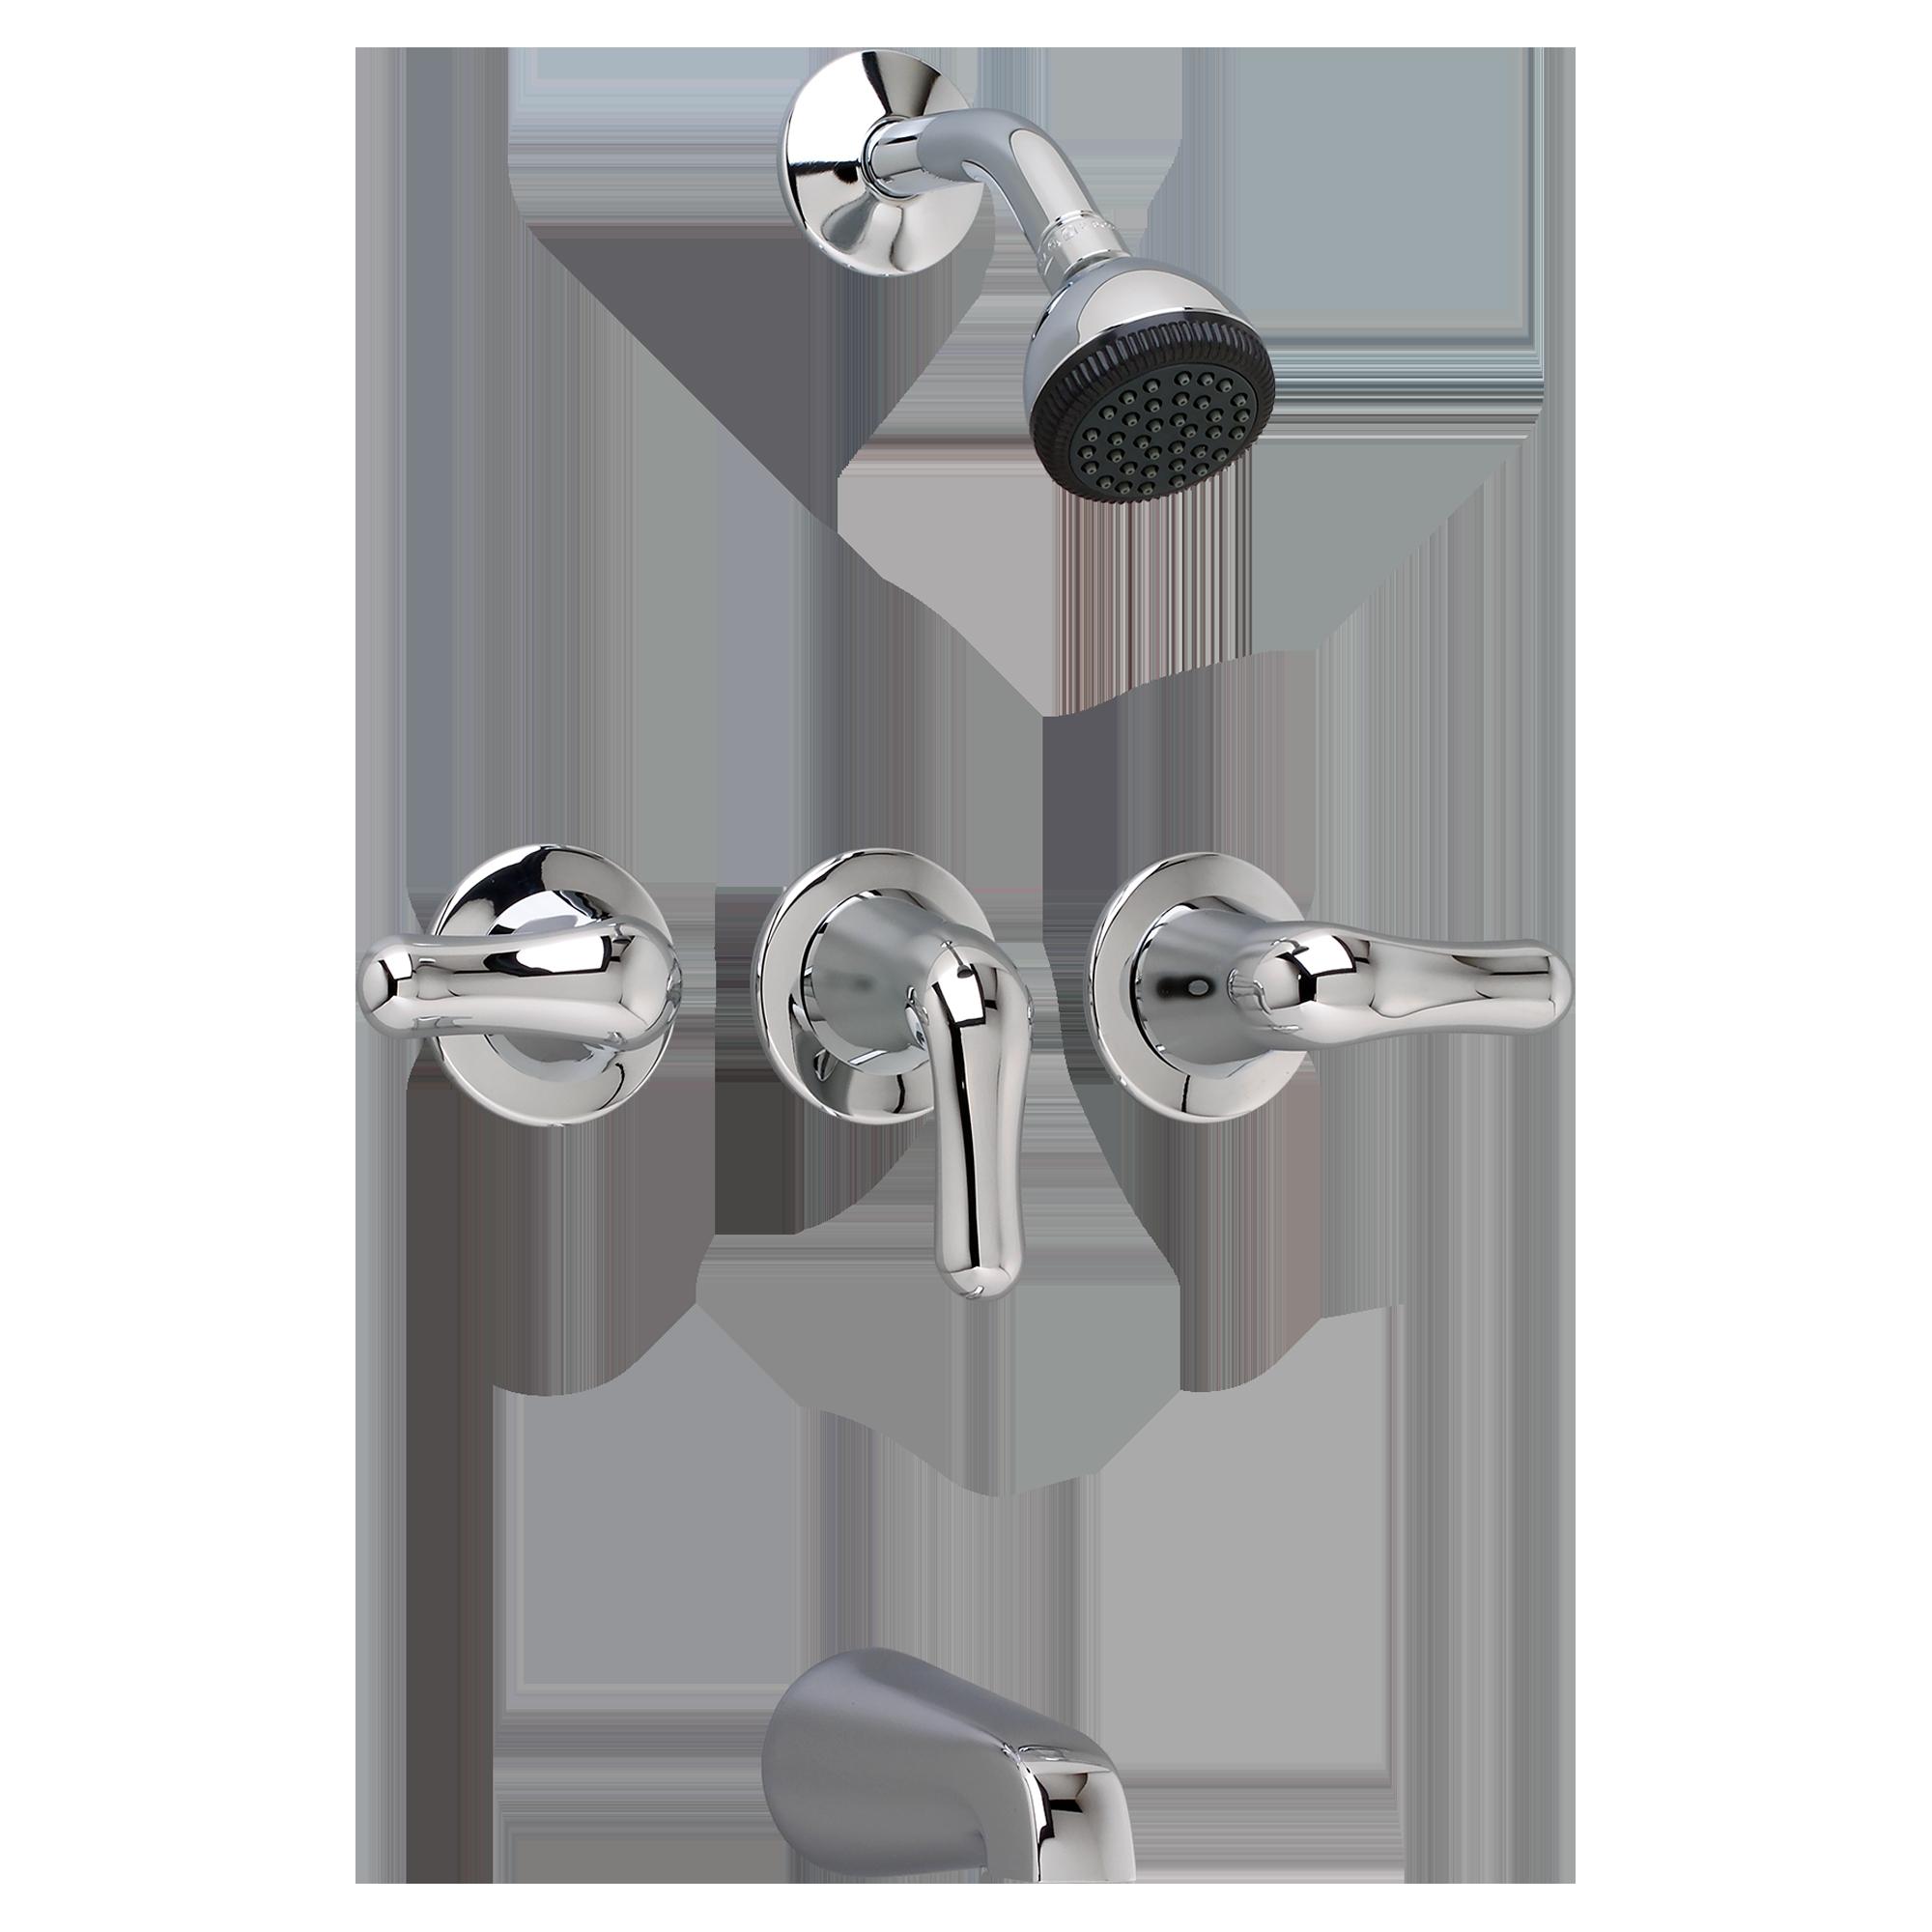 Ideas, three handle bathtub shower faucet three handle bathtub shower faucet colony soft 3 handle bath shower trim kit american standard 2000 x 2000  .